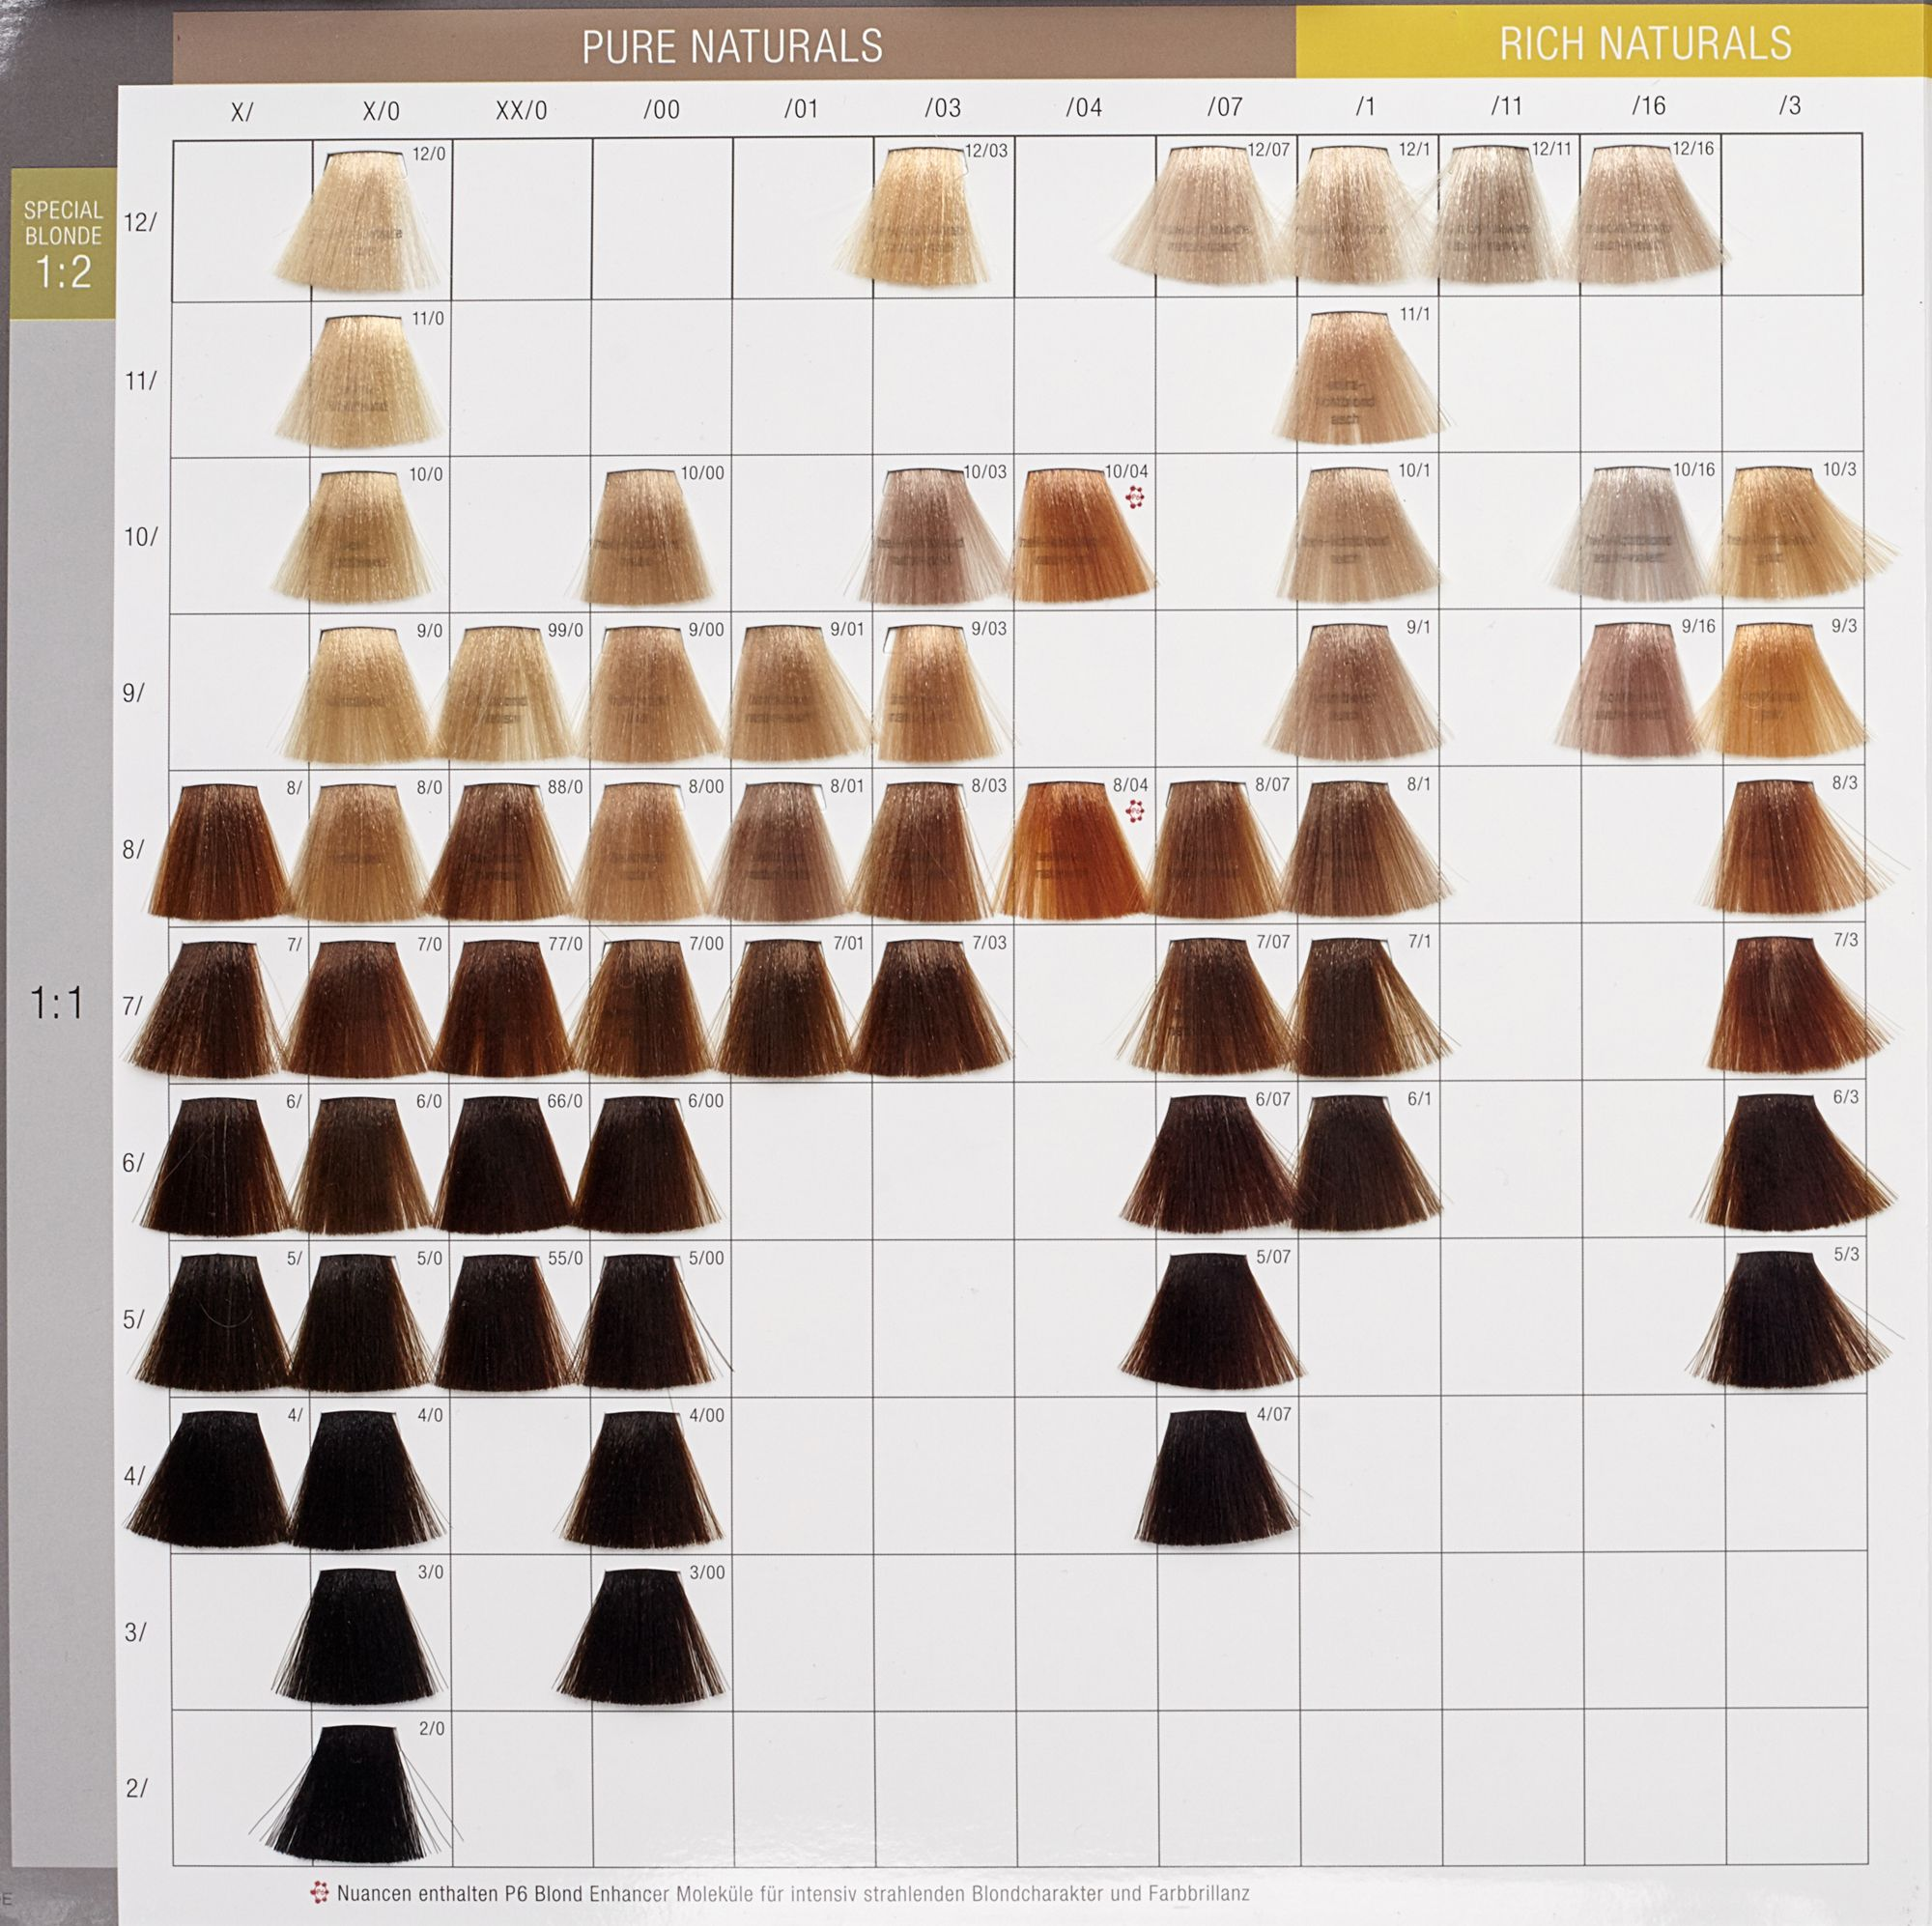 свадебное краска для волос некст палитра цветов фото начала нам необходимо